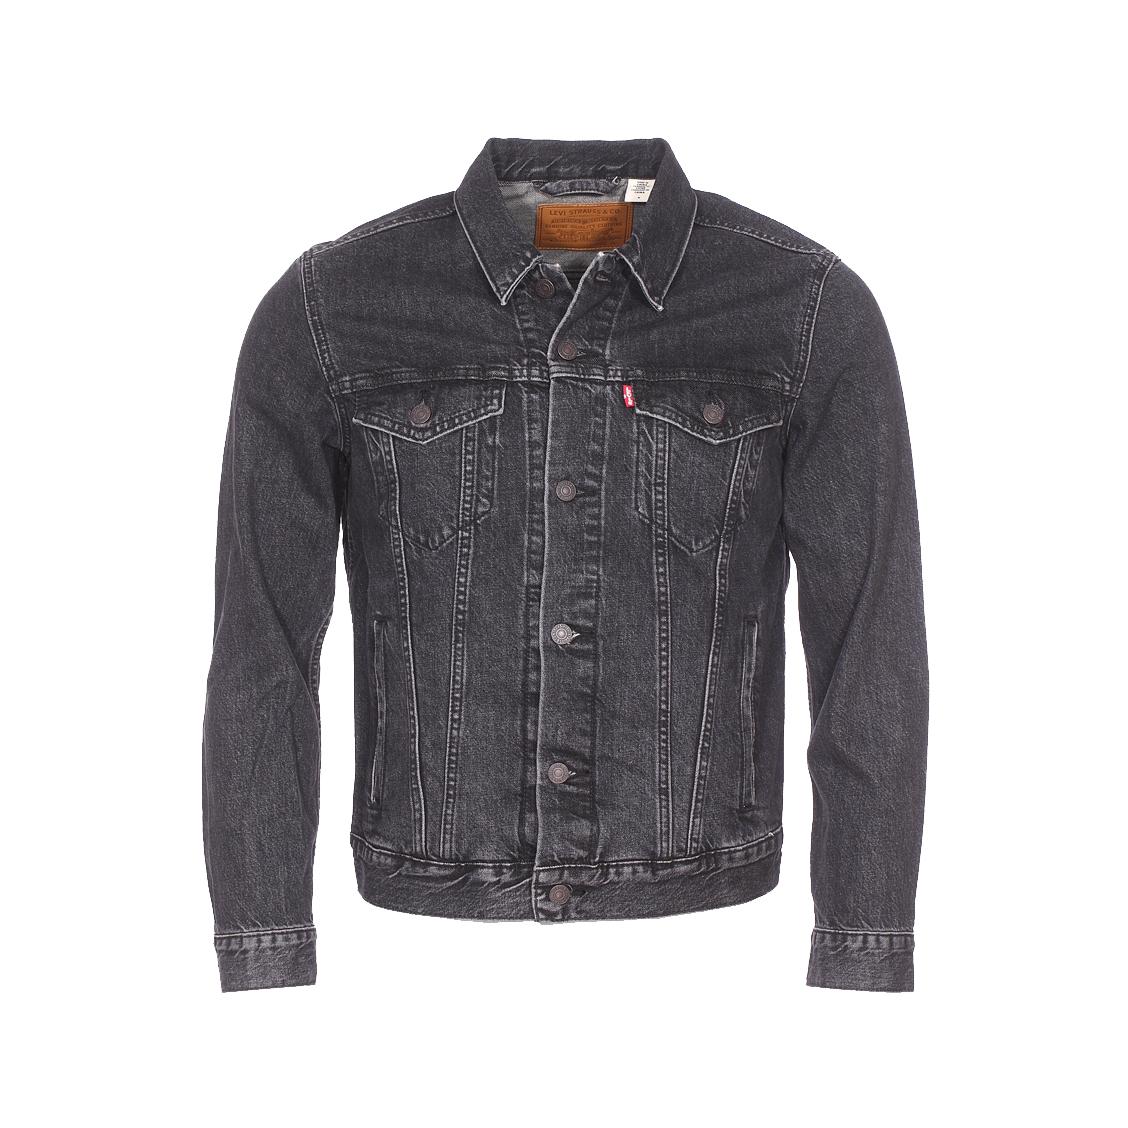 Veste Levi's Trucker en jean gris anthracite. Blouson Levi's  - Coton (100%) - Jean gris anthracite